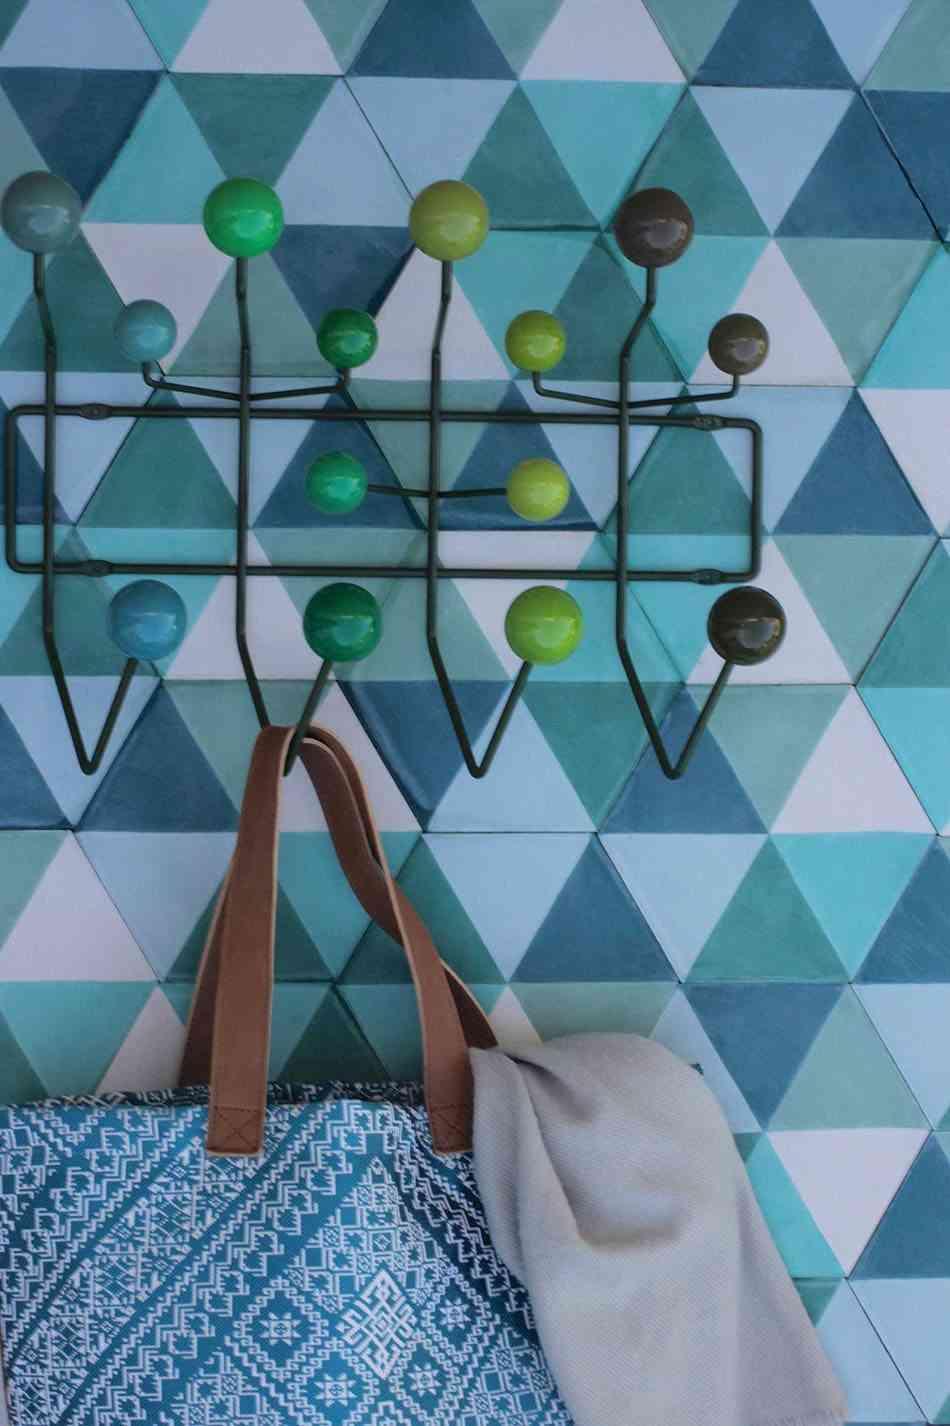 azulejos geometricos popham triangulos